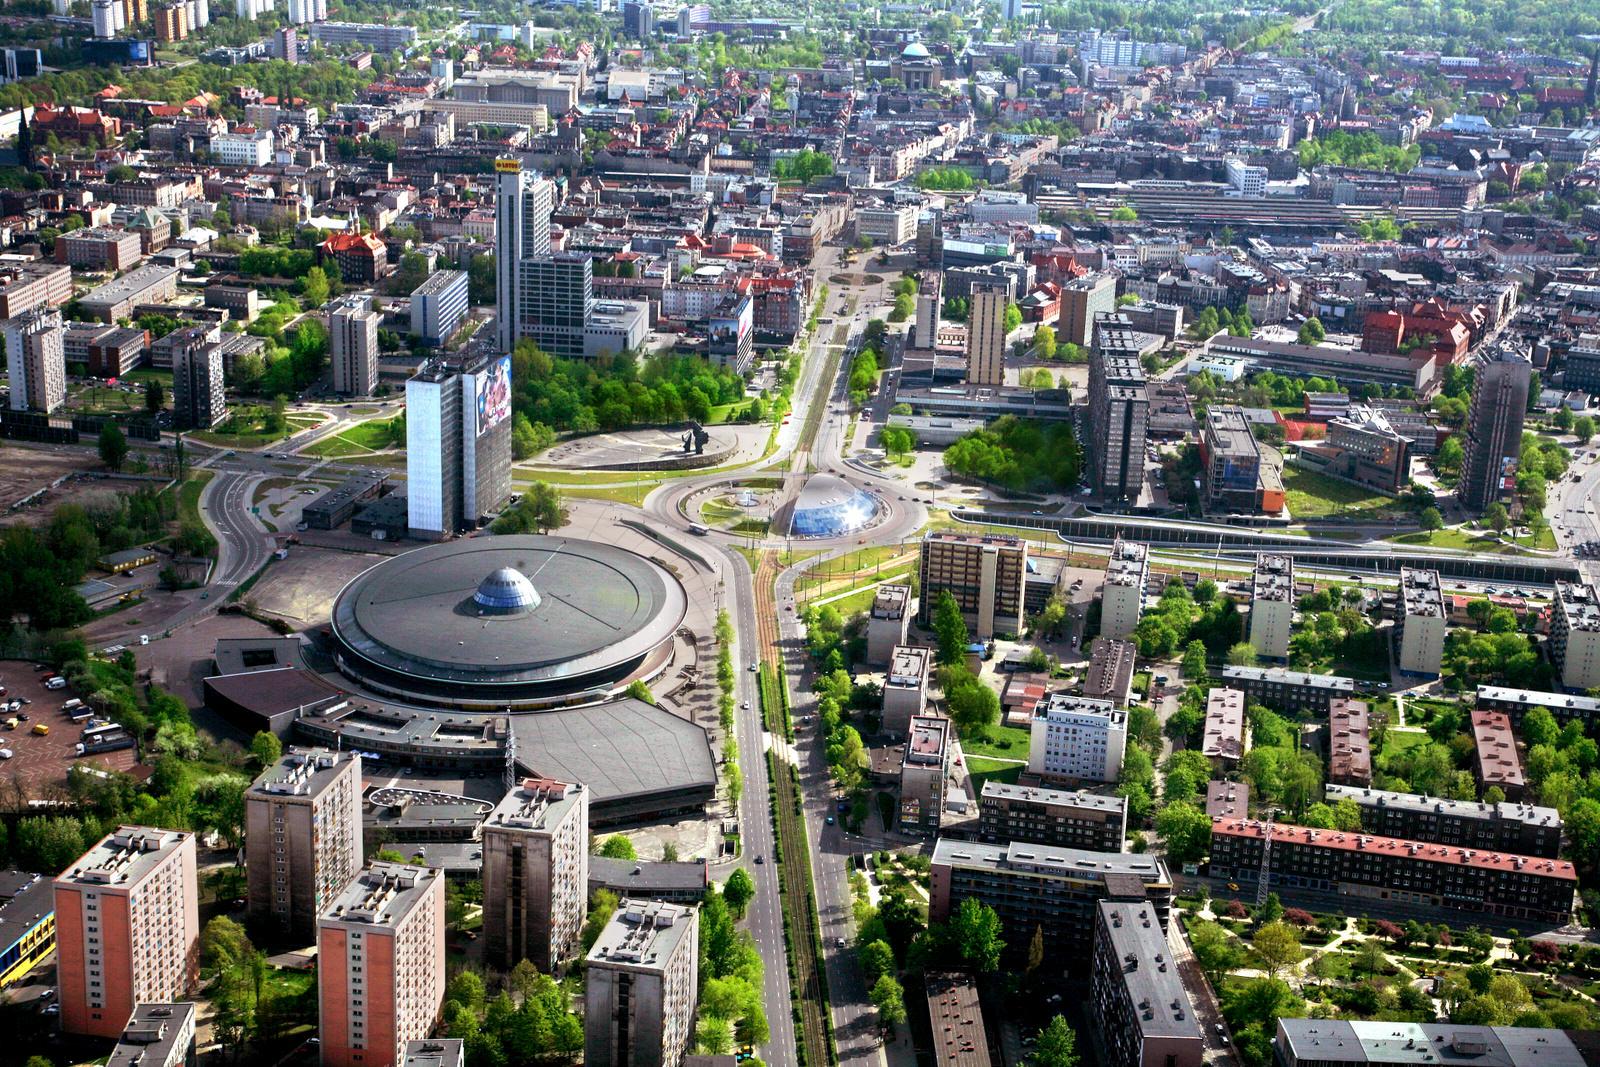 http://upload.wikimedia.org/wikipedia/commons/e/e7/Katowice.jpg